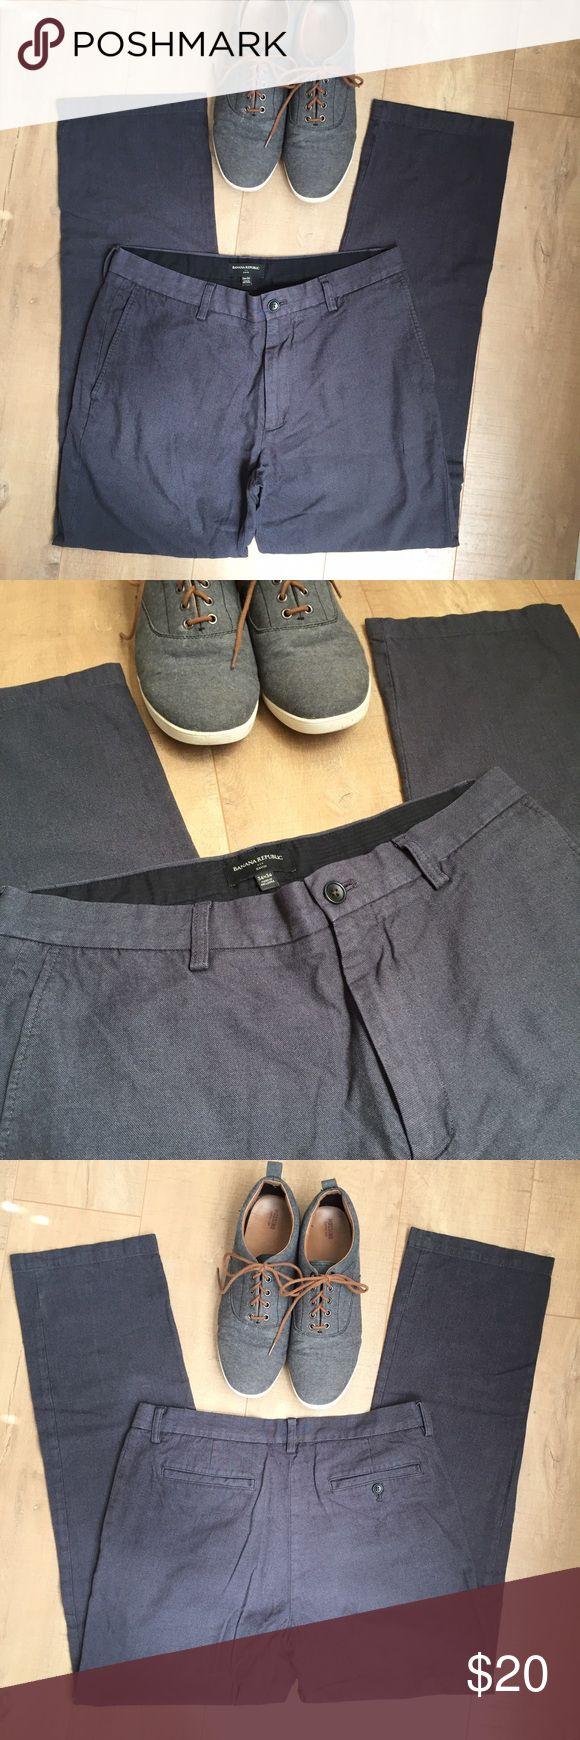 Banana Republic 34x34 Trousers Men's 100% cotton Banana Republic dress pants. Gently worn, grey trousers. Gavin style, 34x34 Banana Republic Pants Dress